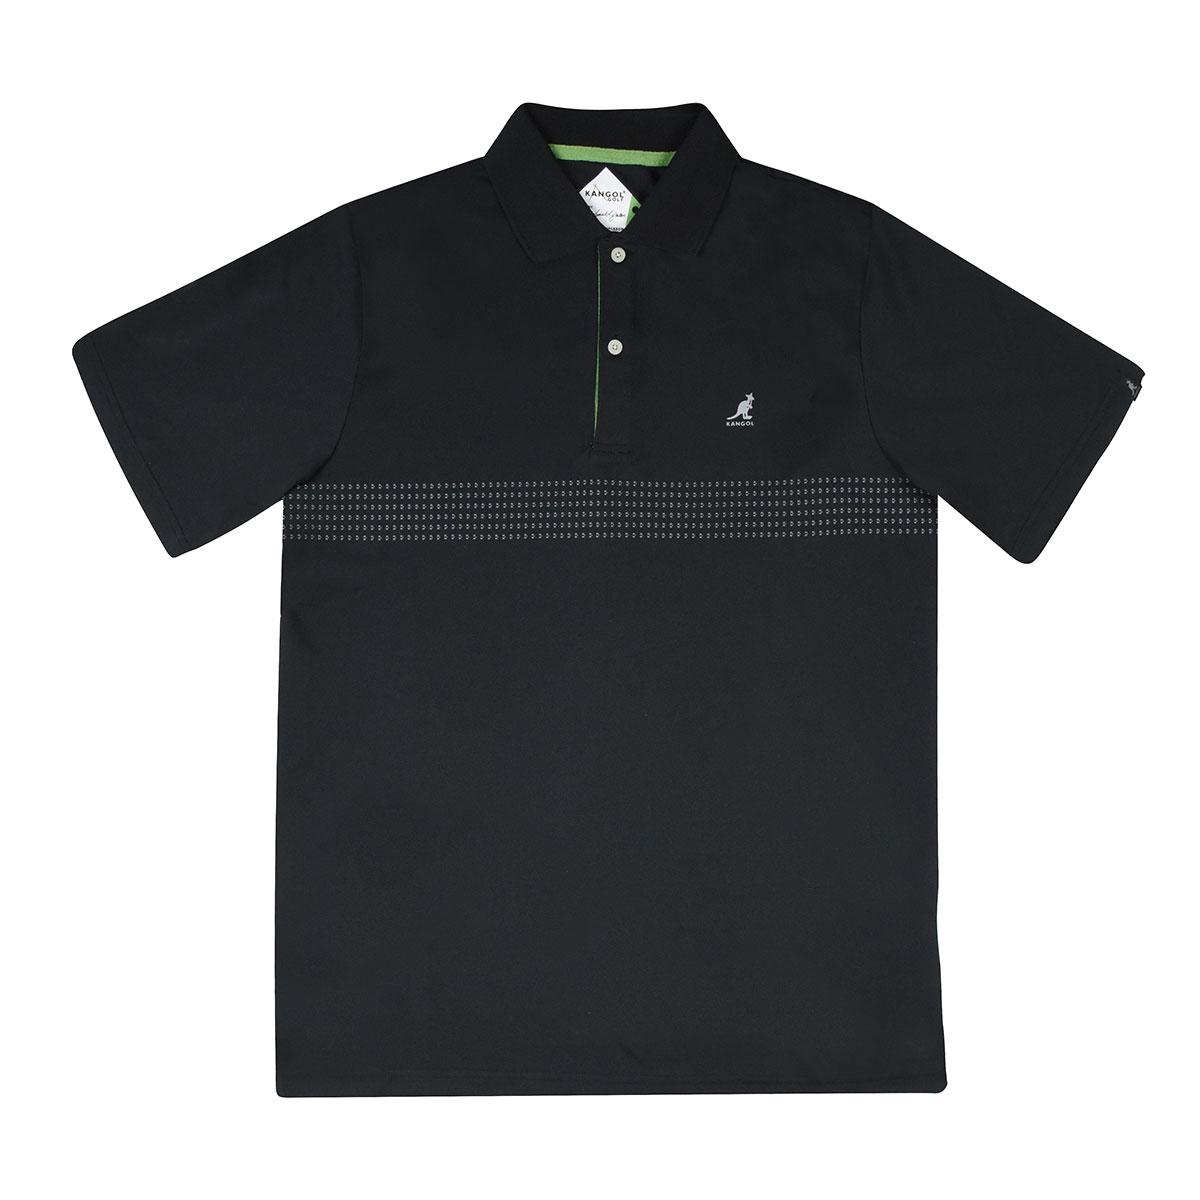 Kangol Samuel L. Jackson Golf Ventair Polo Shirt in Black